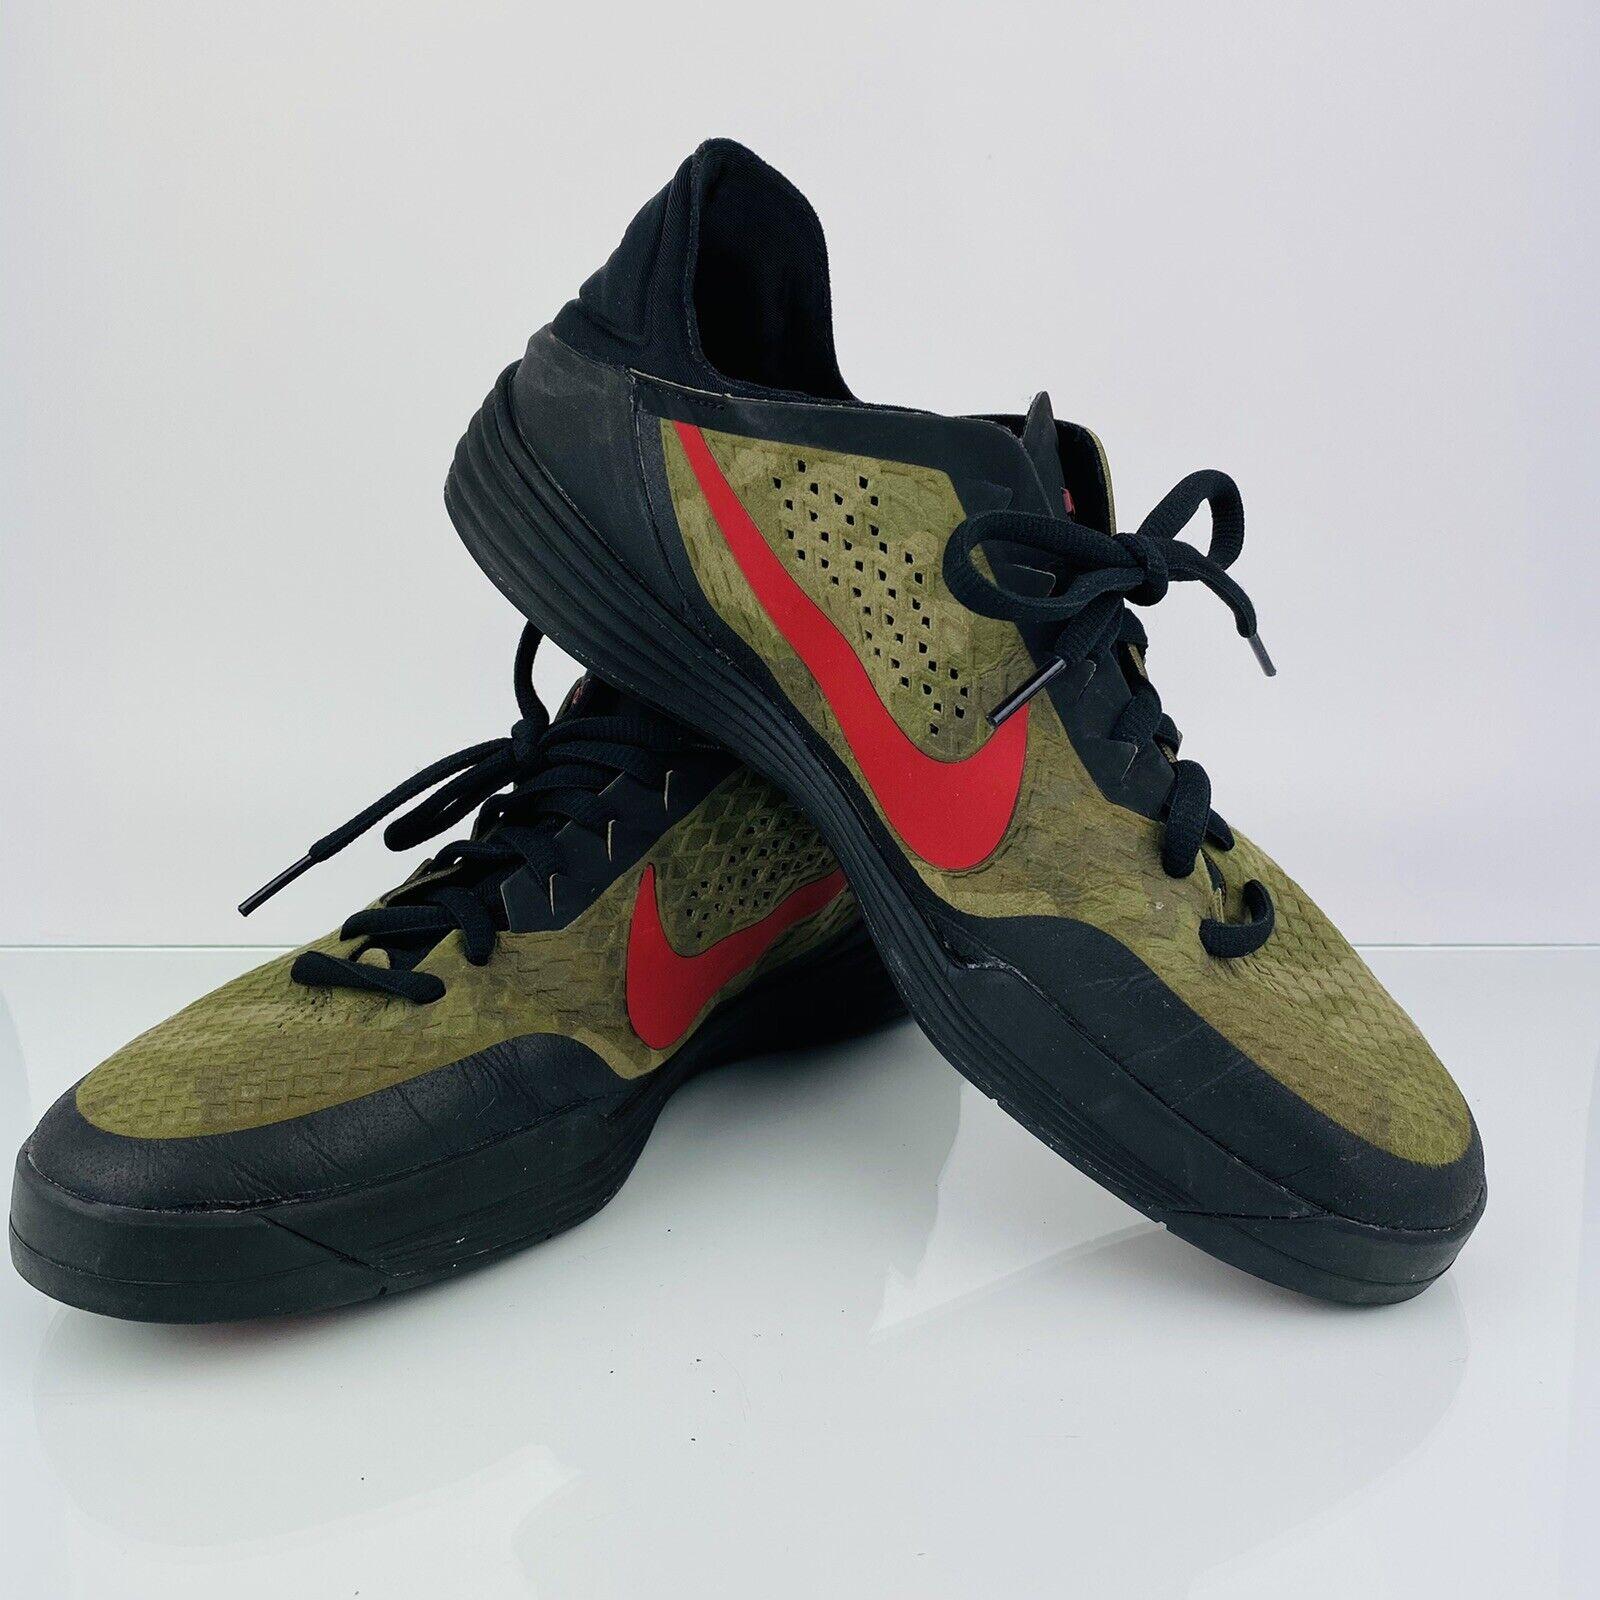 Men's Nike Zoom Paul Rodriguez 4 IV